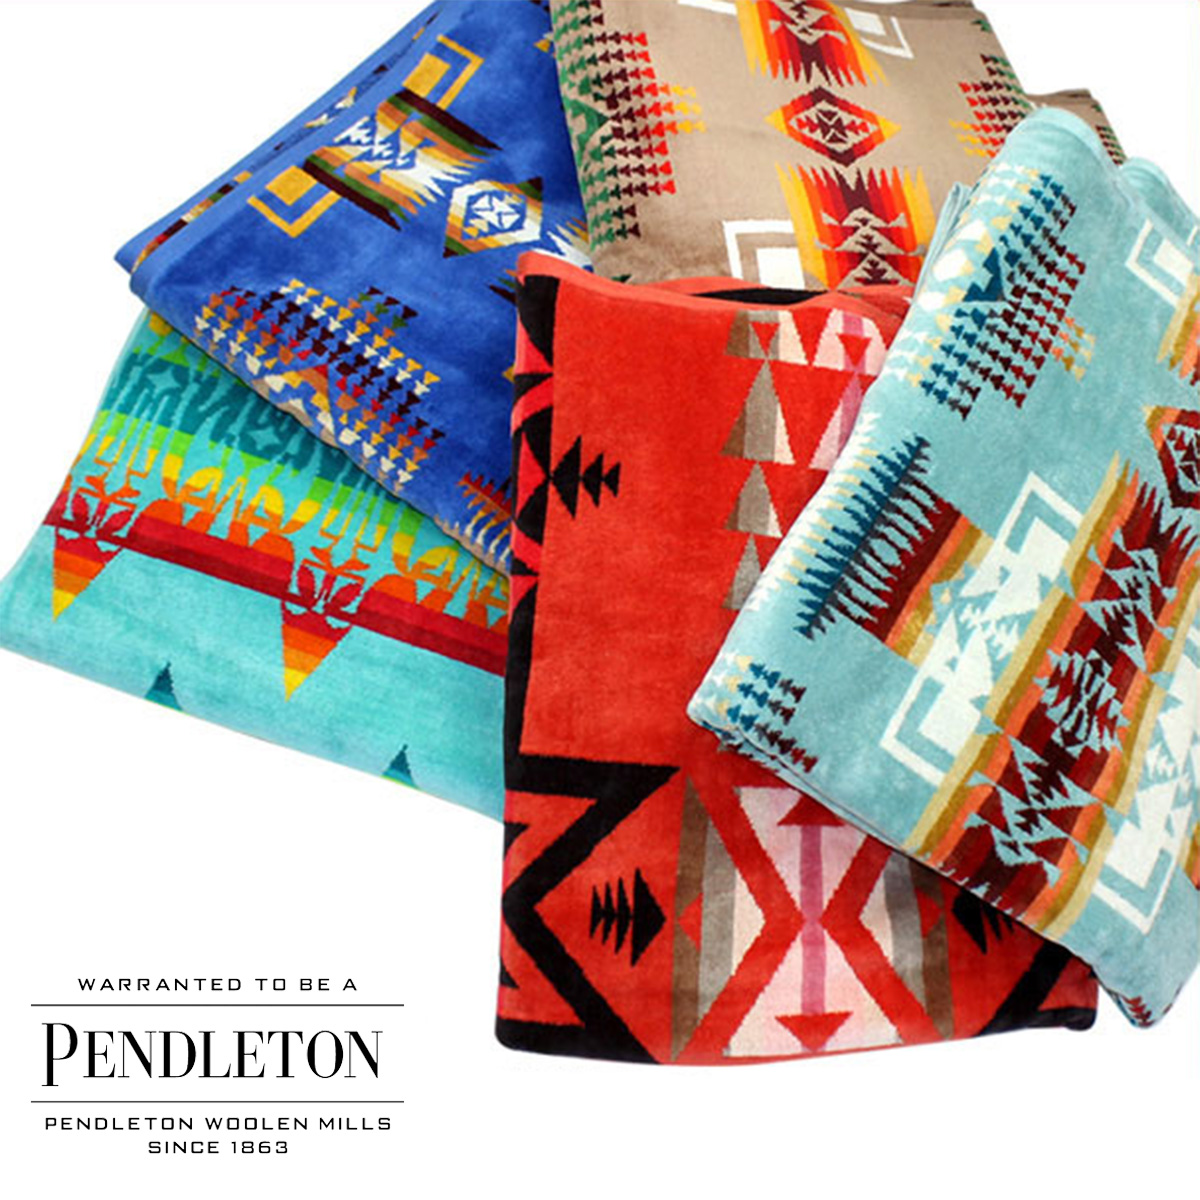 PENDLETON pen Dalton blanket towel bath towel towelling blanket beach towel XB233 20 color men gap Dis [the 8/29 additional arrival]